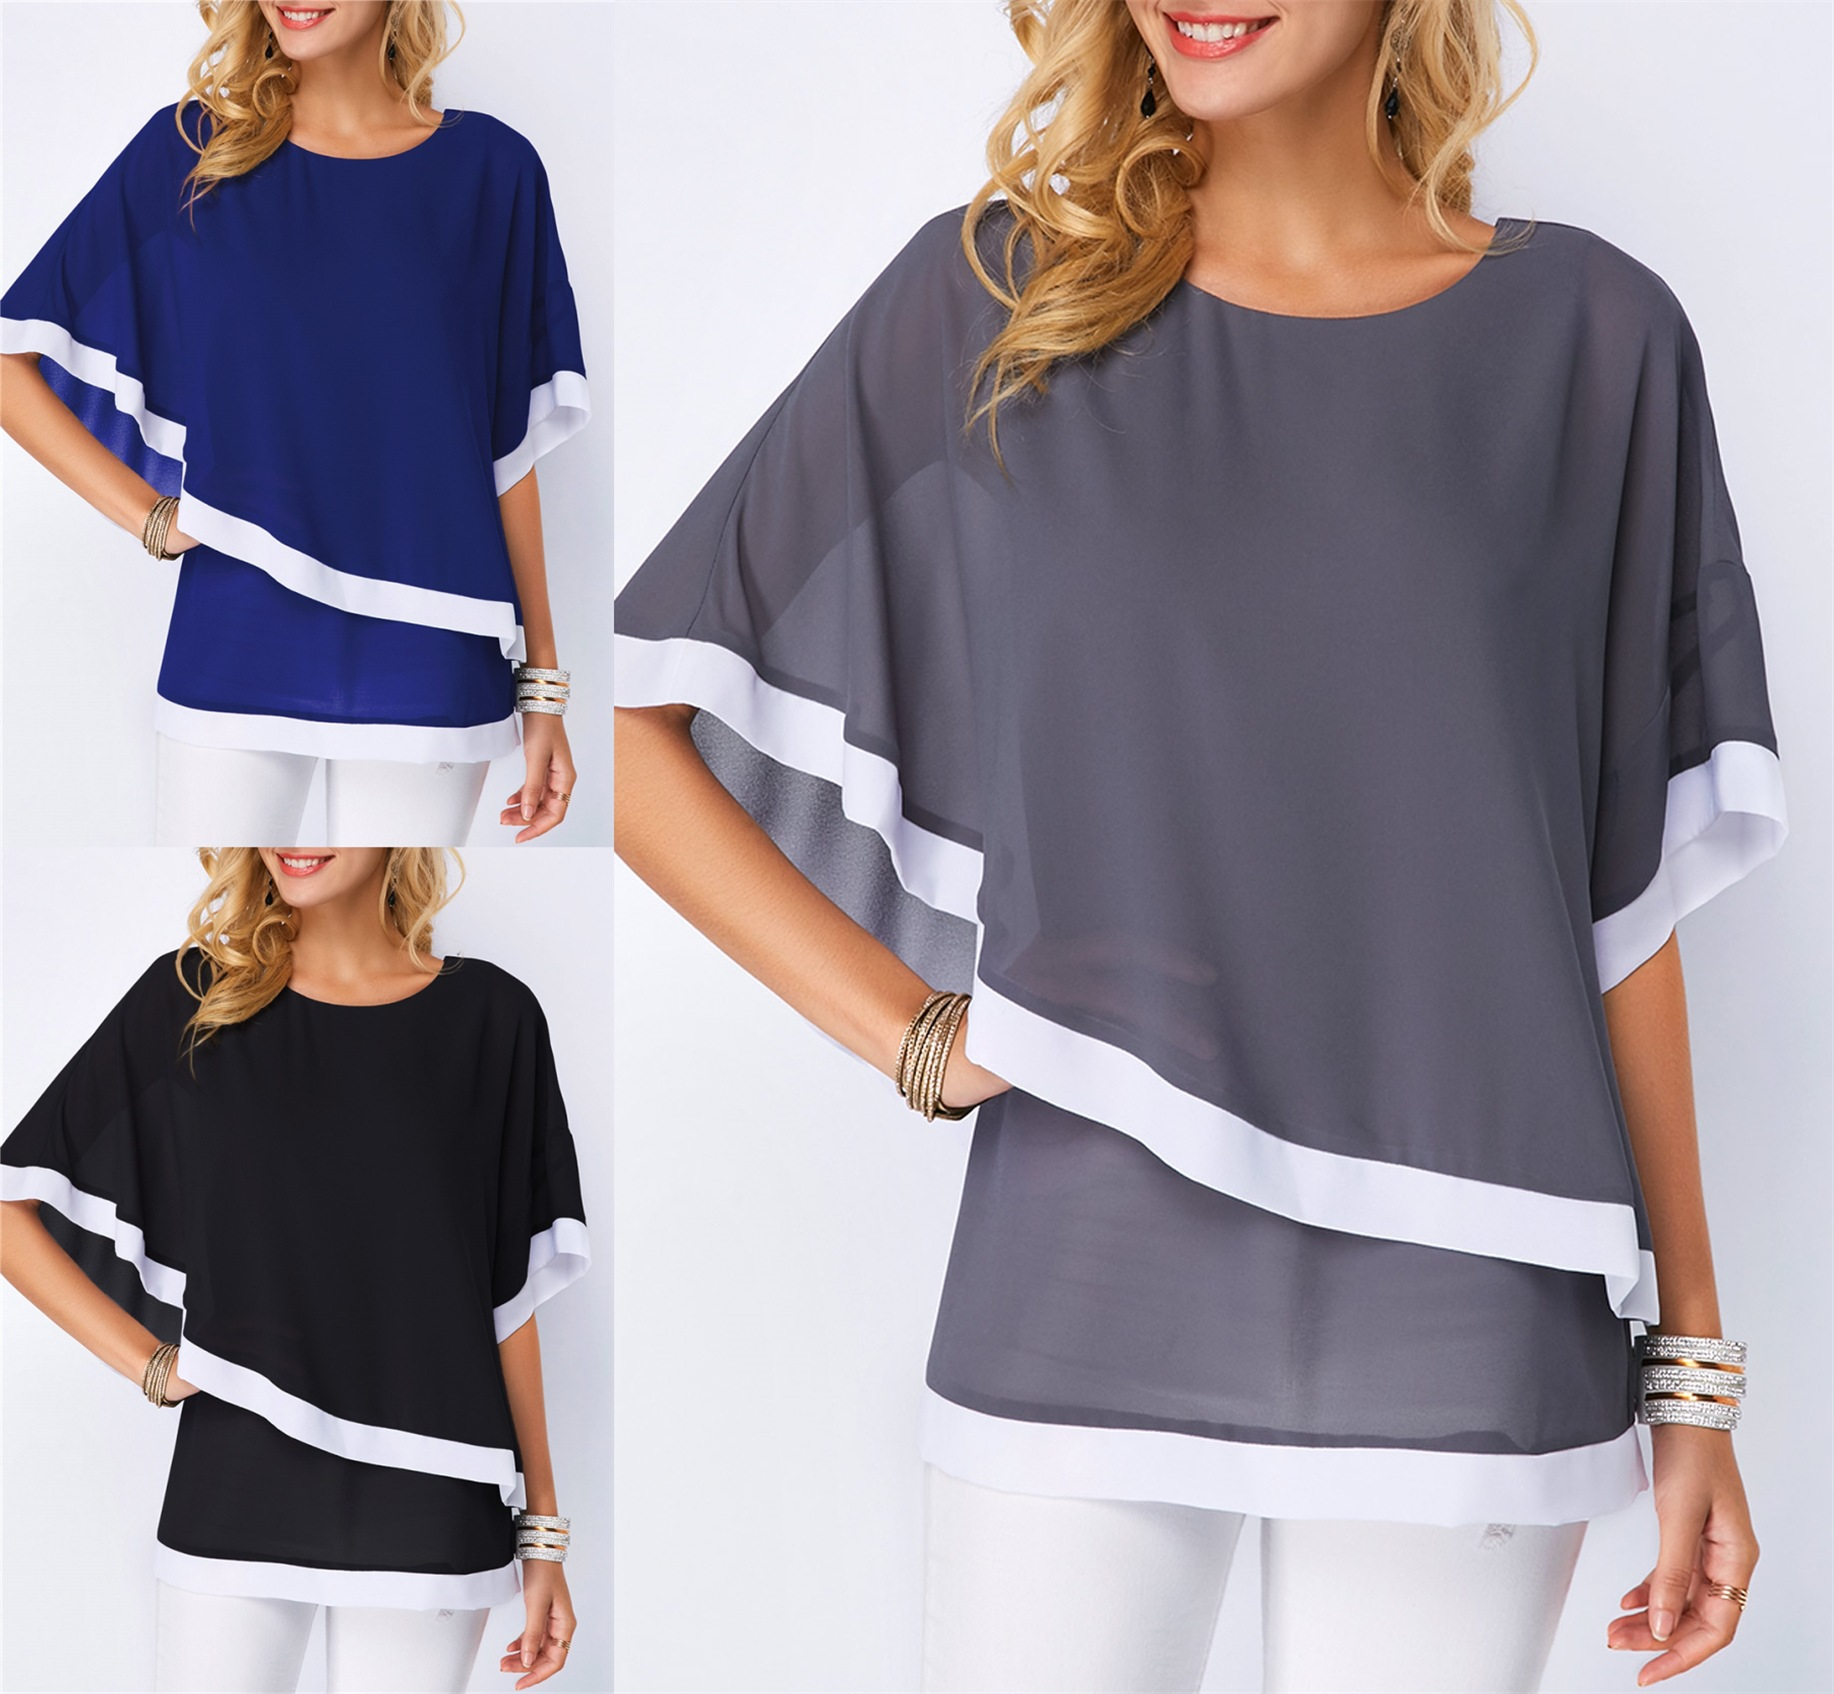 2019 Summer Fashion Floral Print Women Chiffon Shirts Lantern Sleeves Casual Loose Blouses Ruffled Holiday Fairy Blusas Tops Women's Clothing